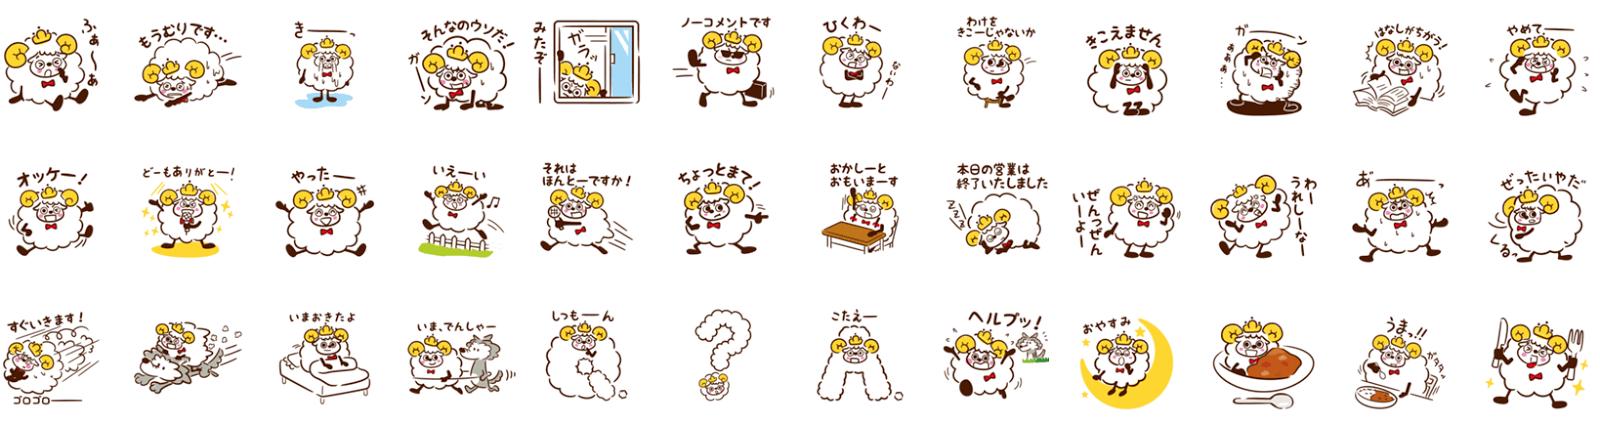 http://line.me/S/sticker/1065379